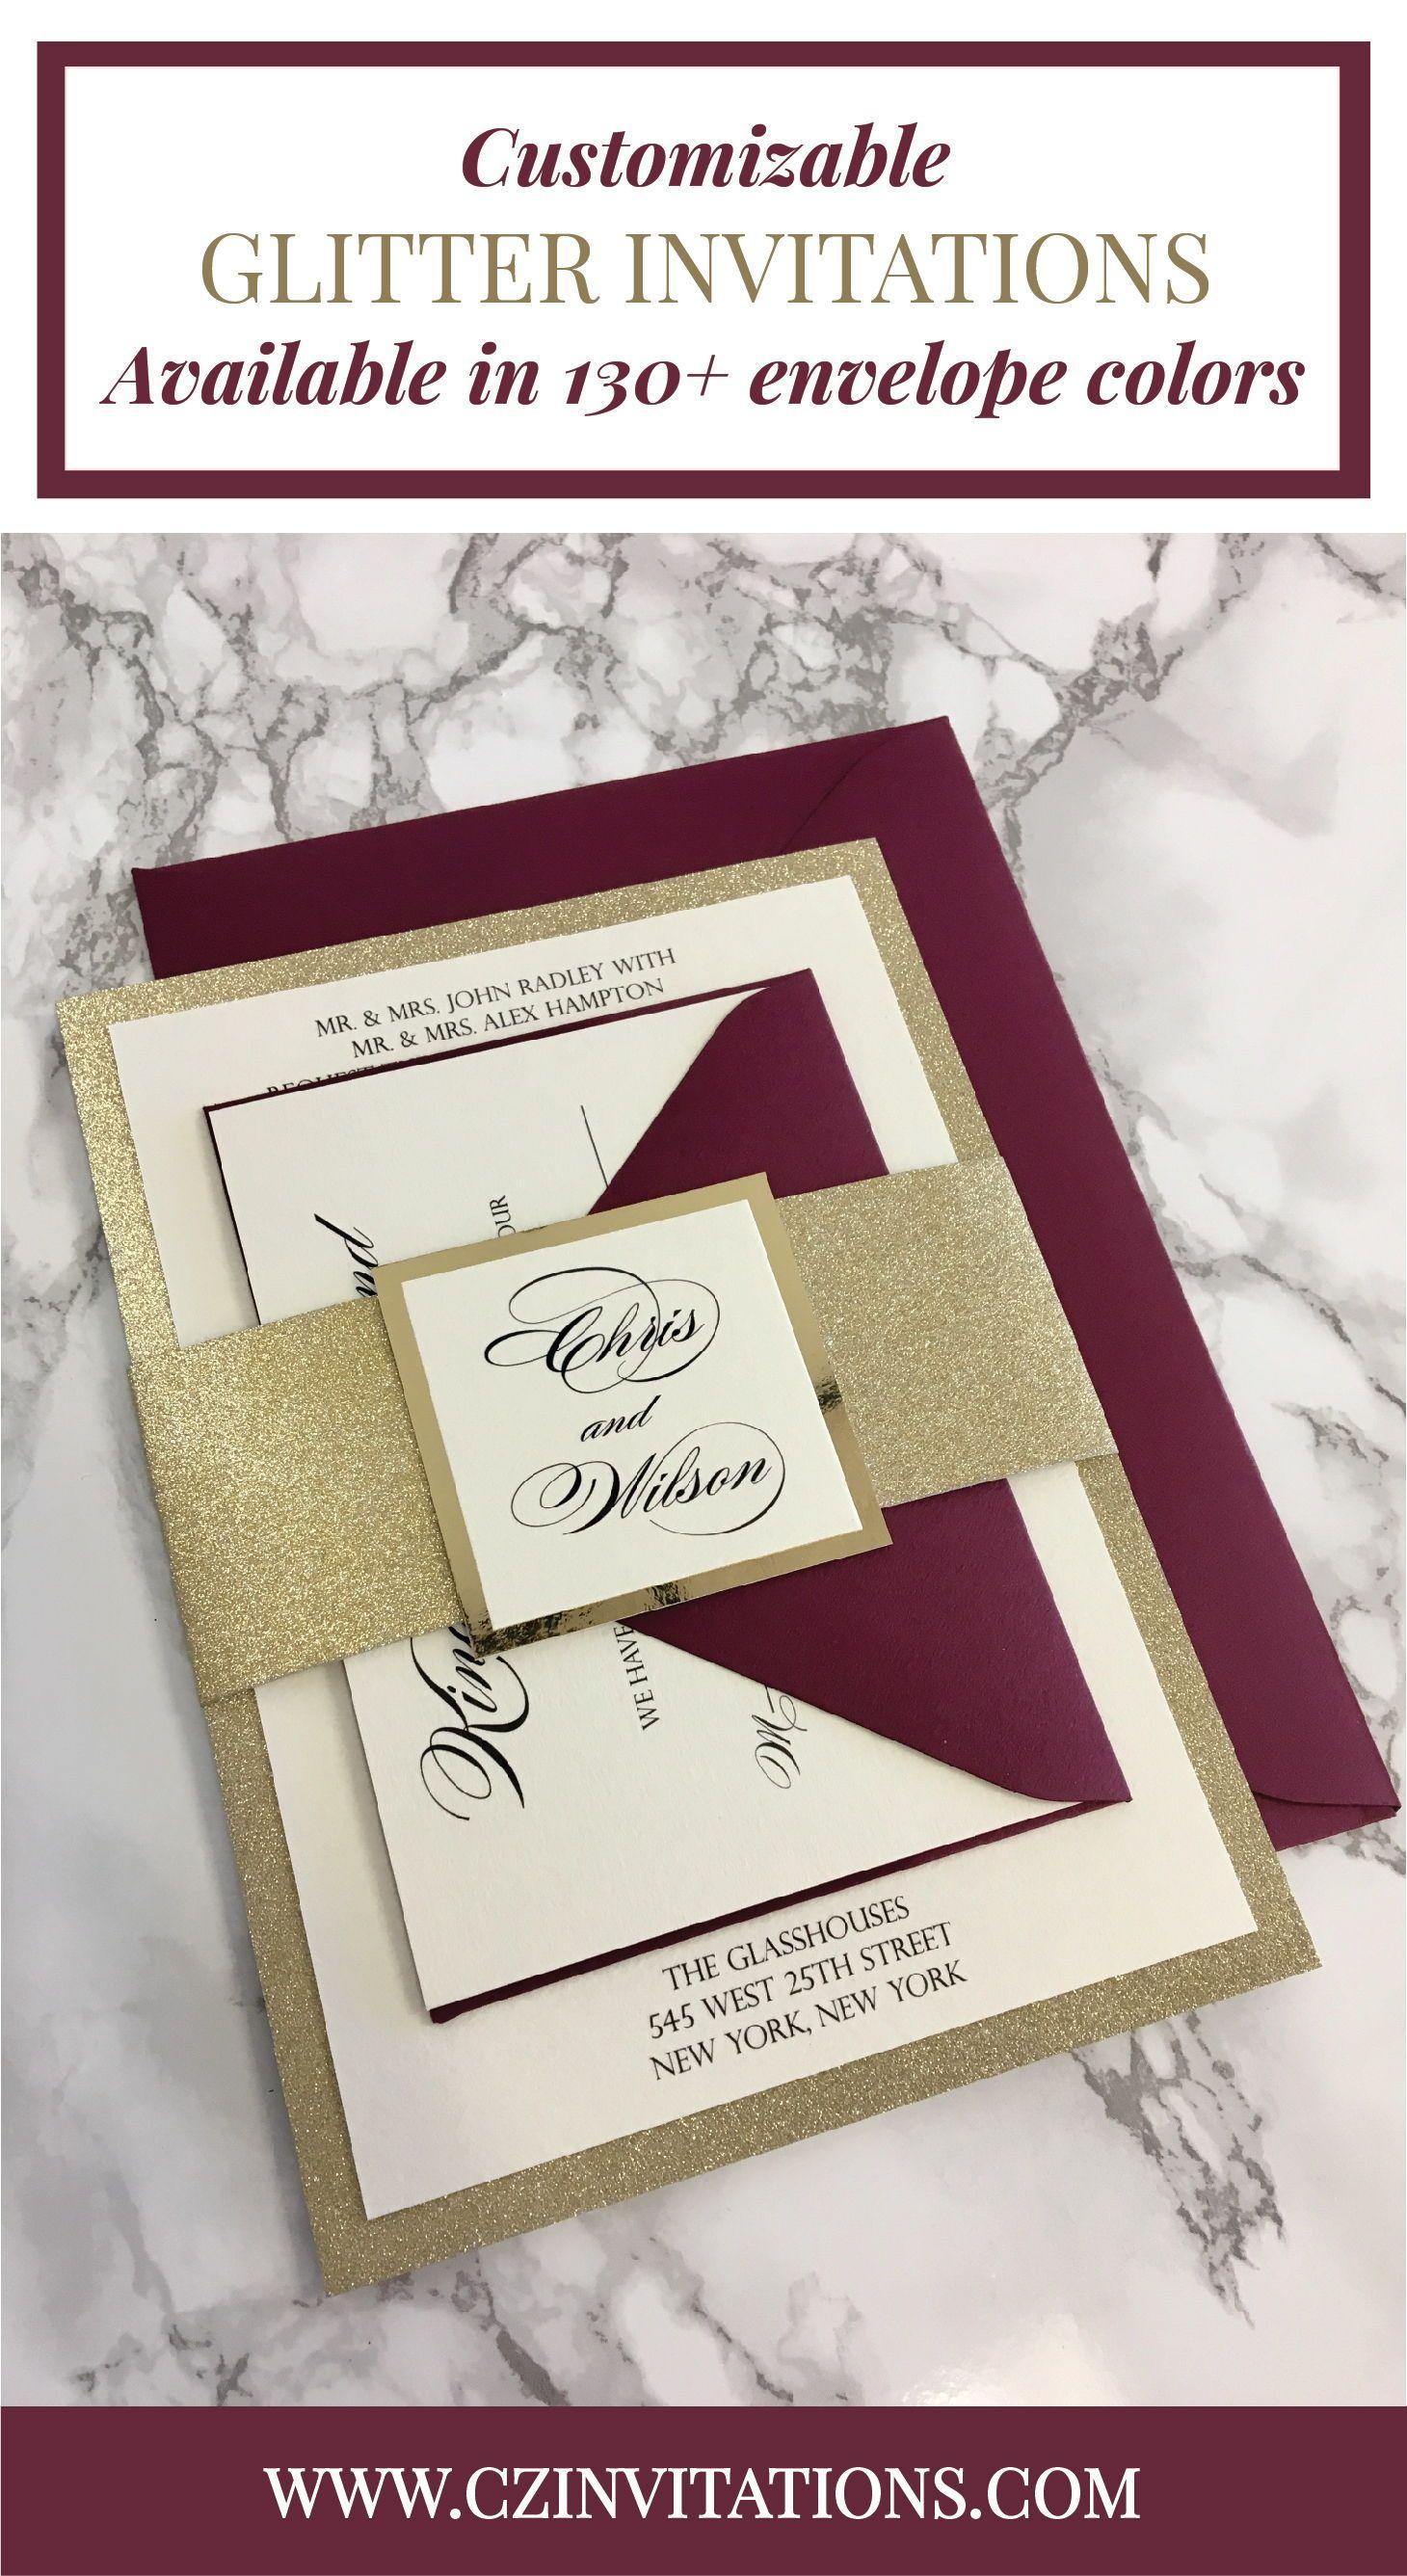 Gold glitter wedding invitation with burgundy envelopes pinterest